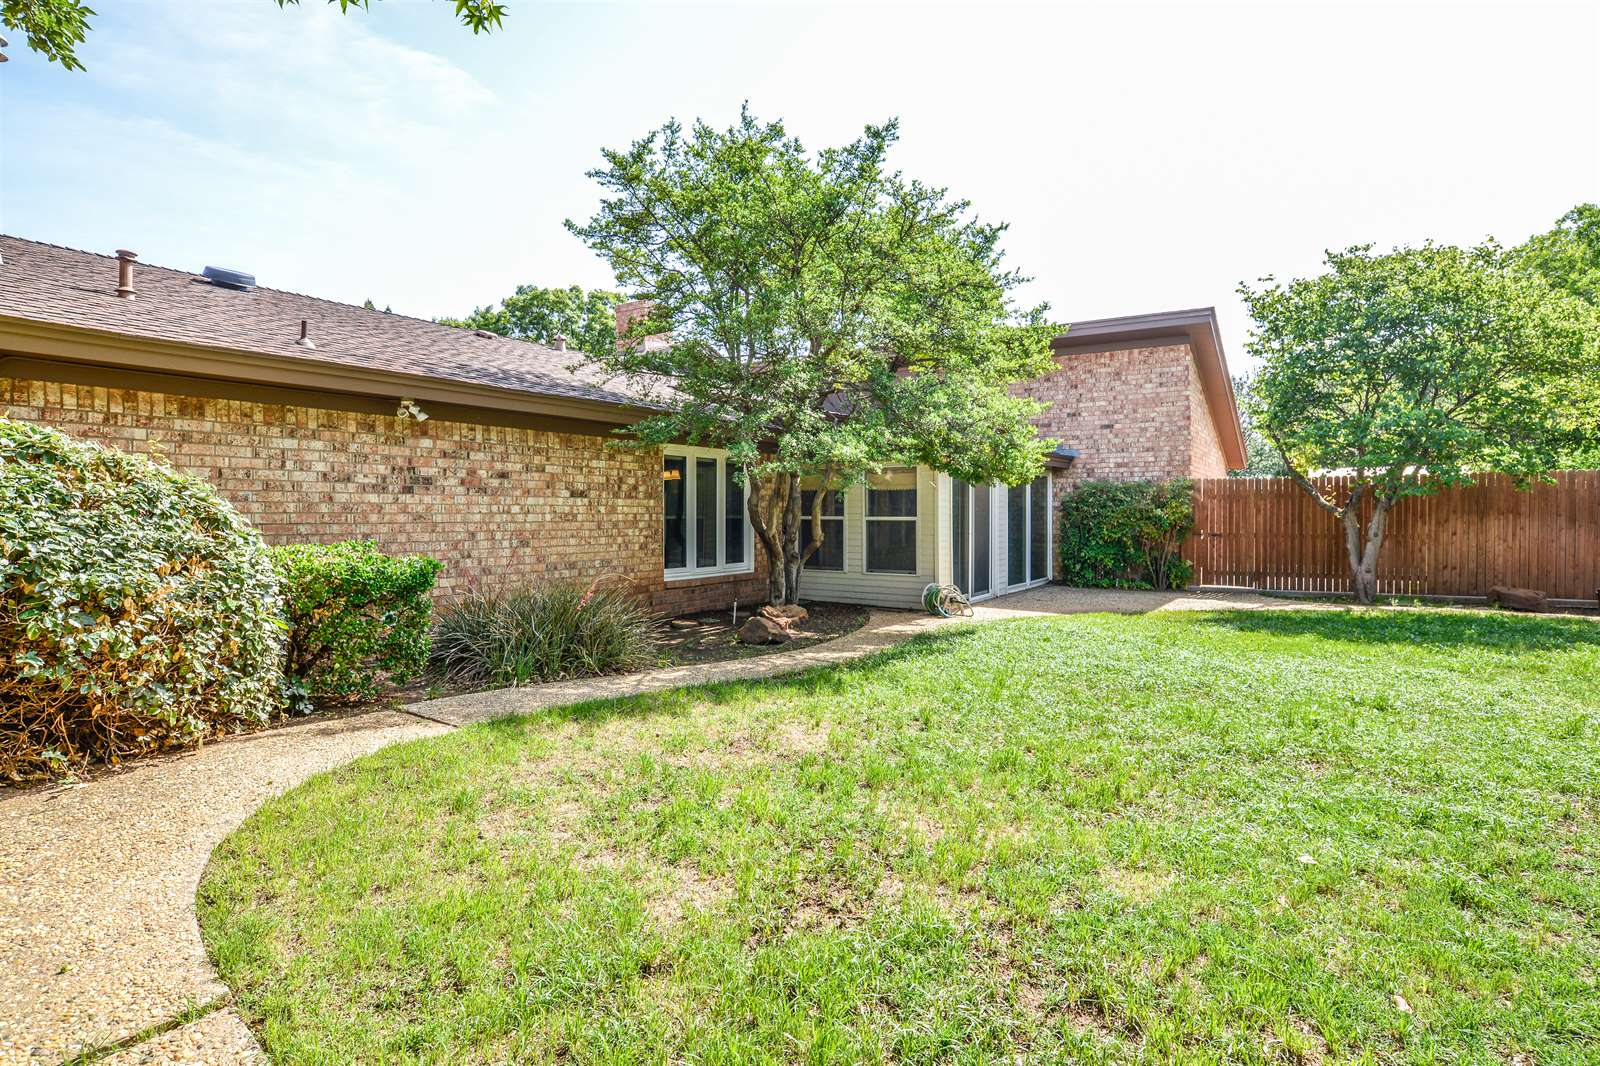 5729 70th Pl, Lubbock, TX 79424